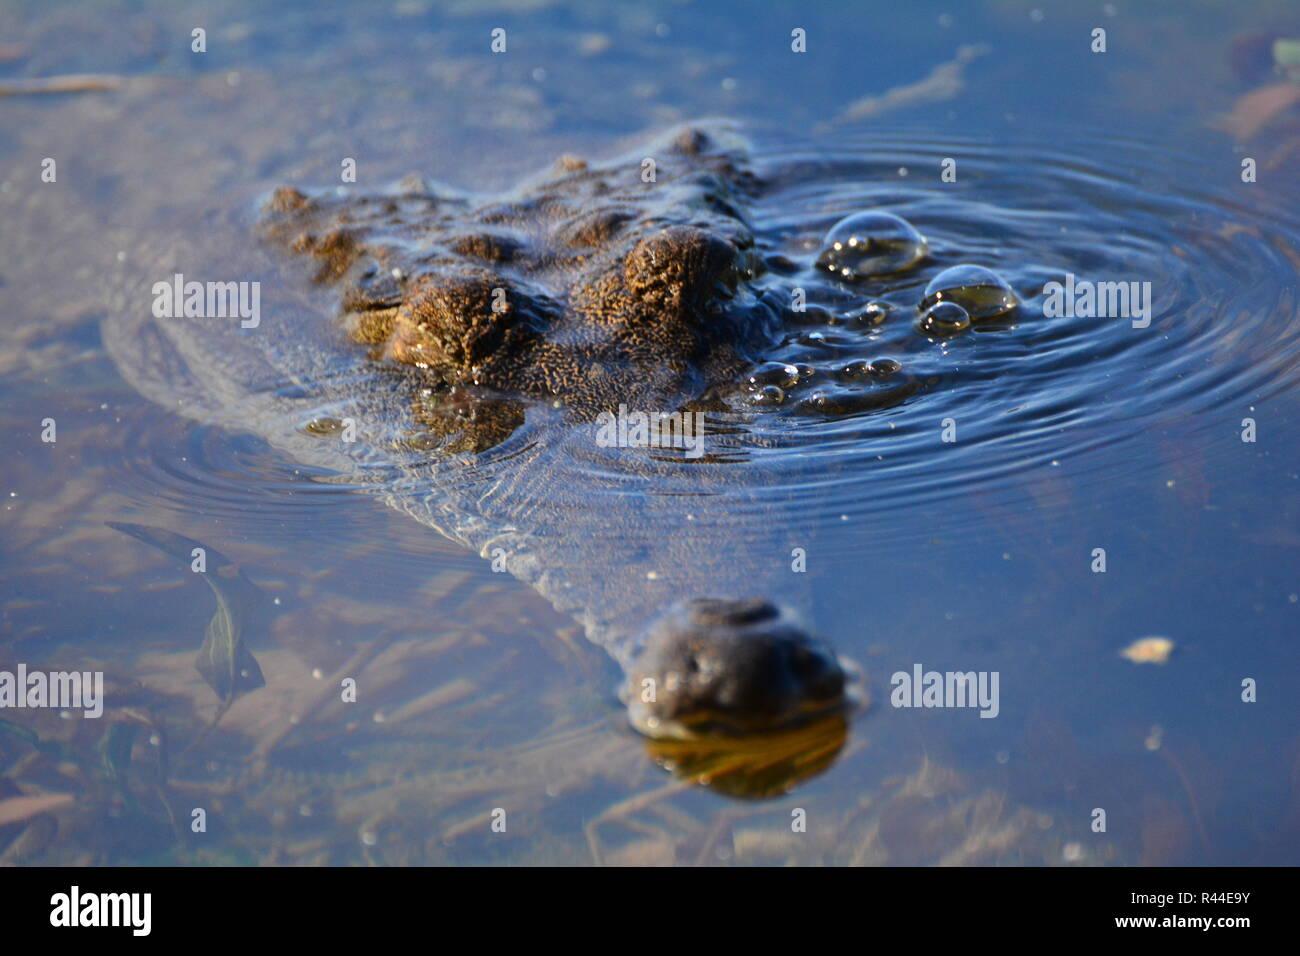 crocodile head - Stock Image